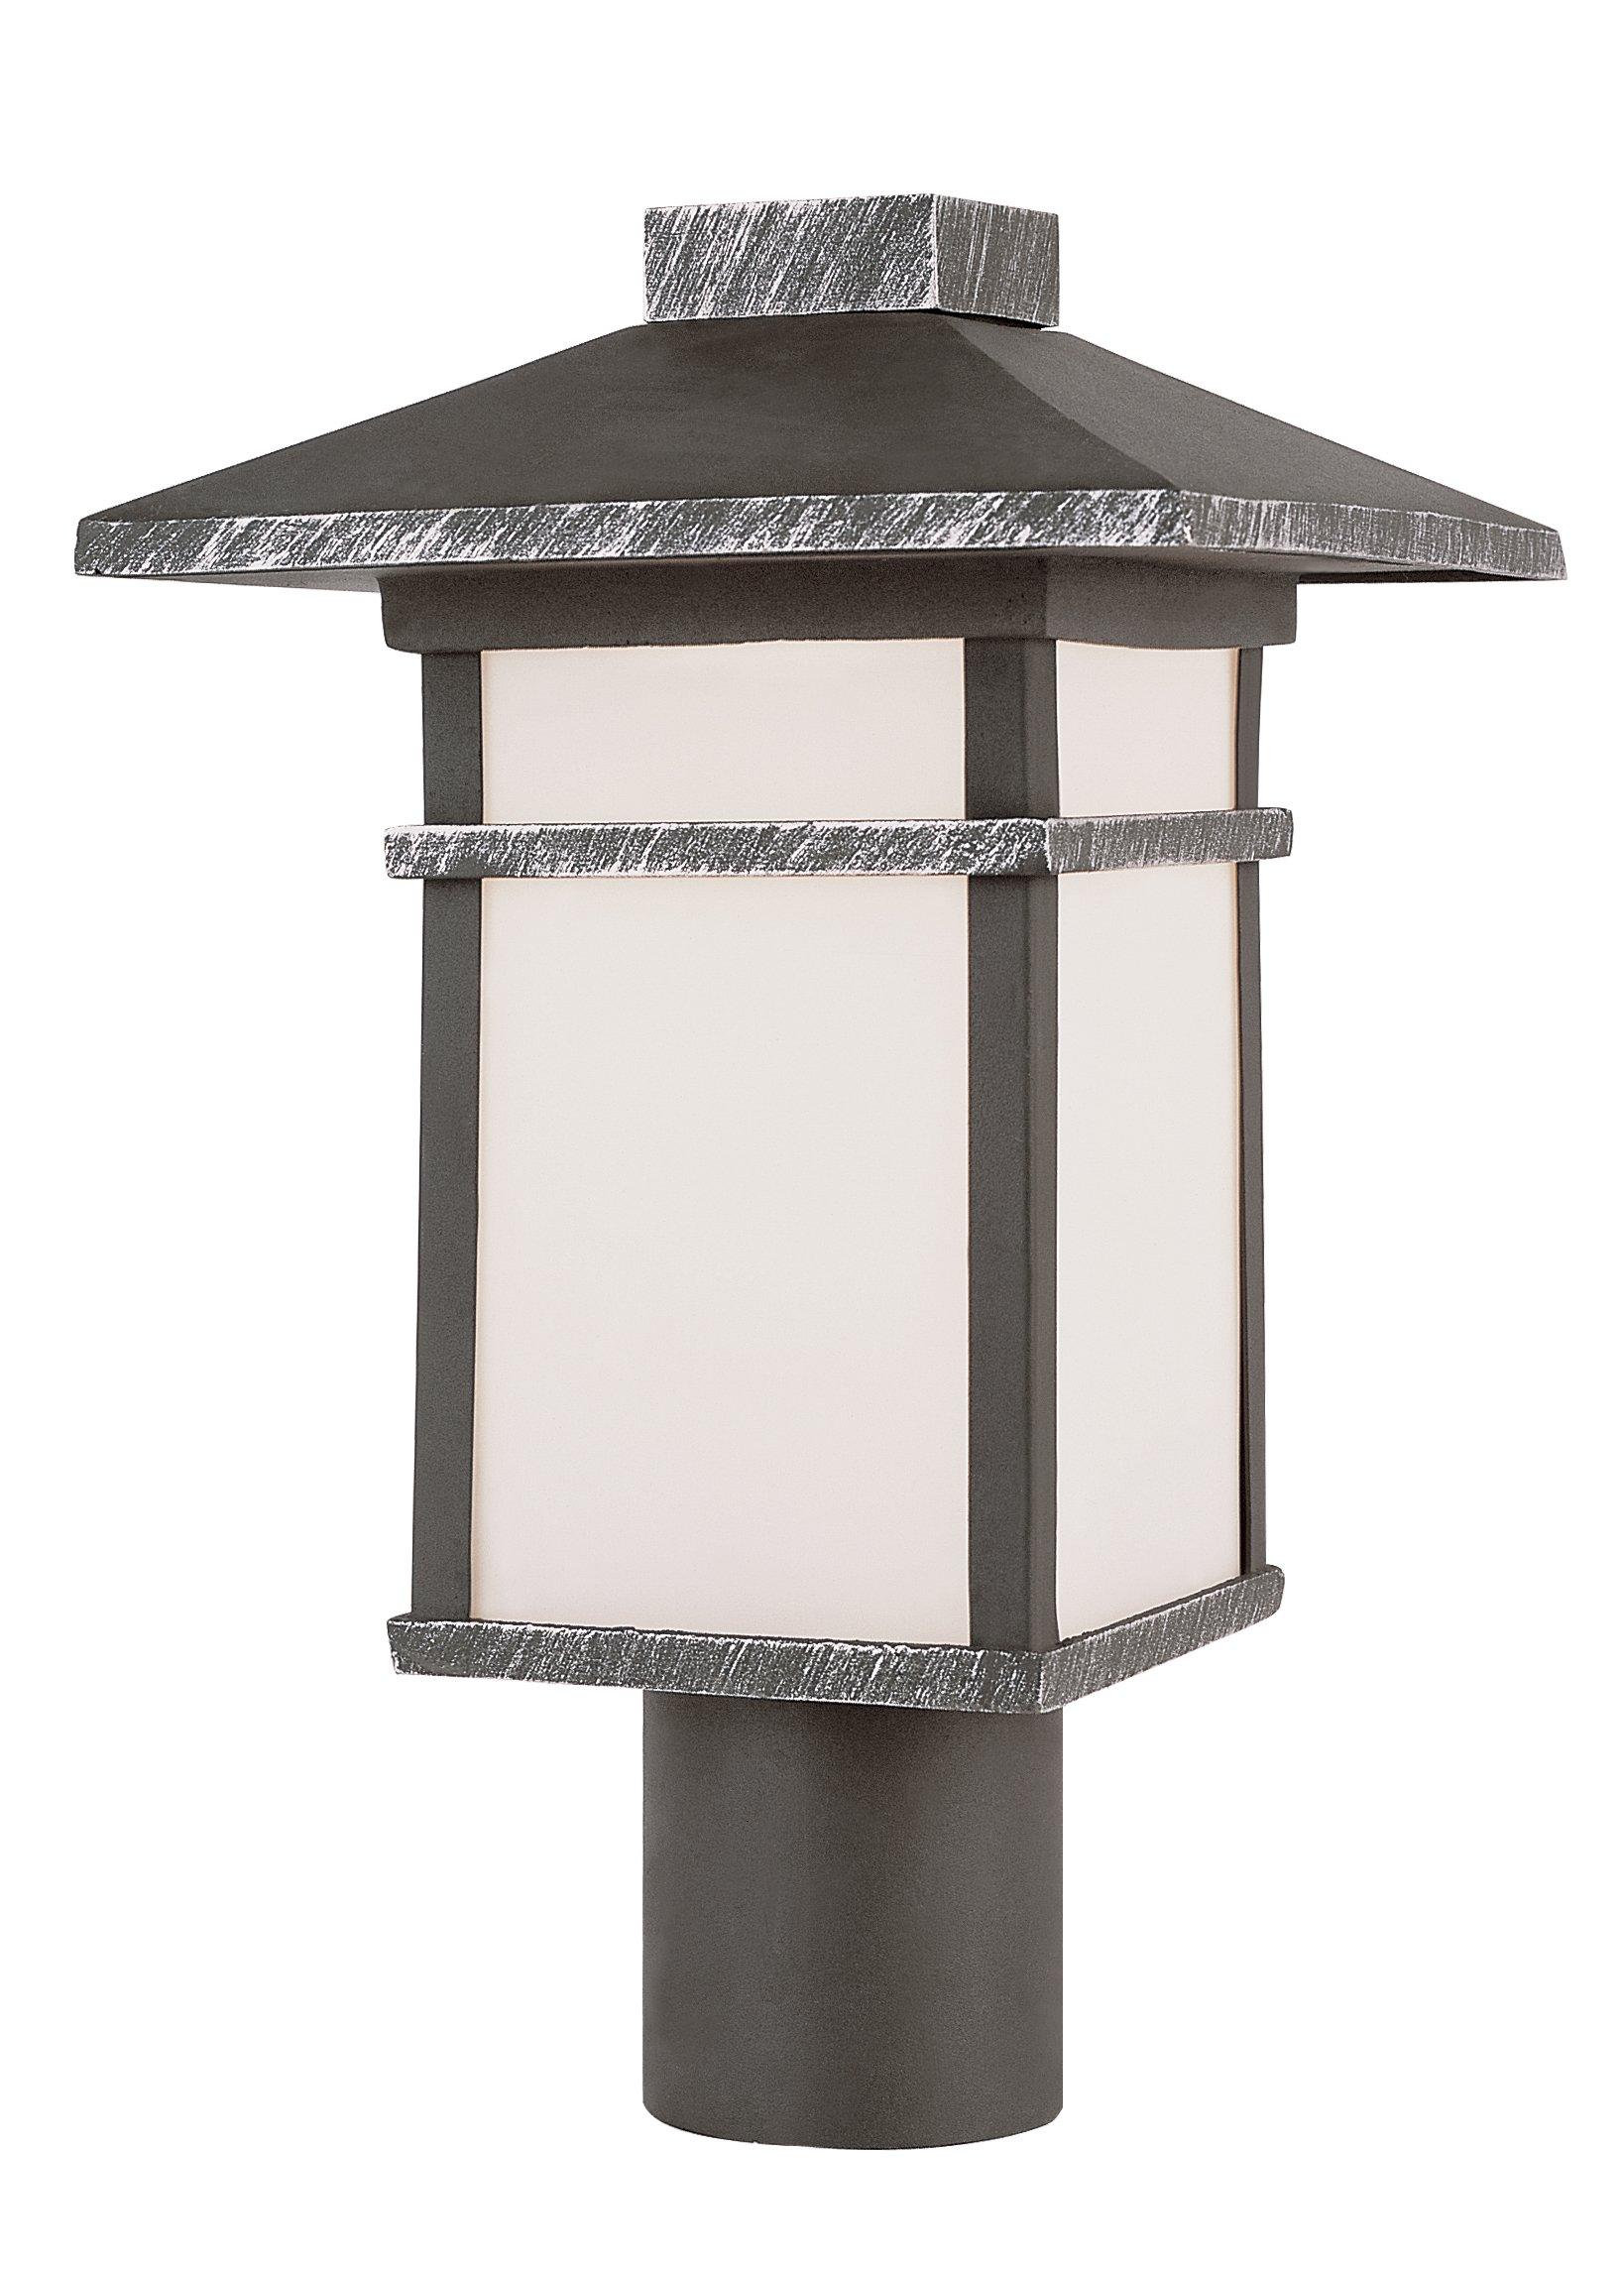 Trans Globe Lighting 40025 BK 17-Inch Mission Post Mount Lantern, Black